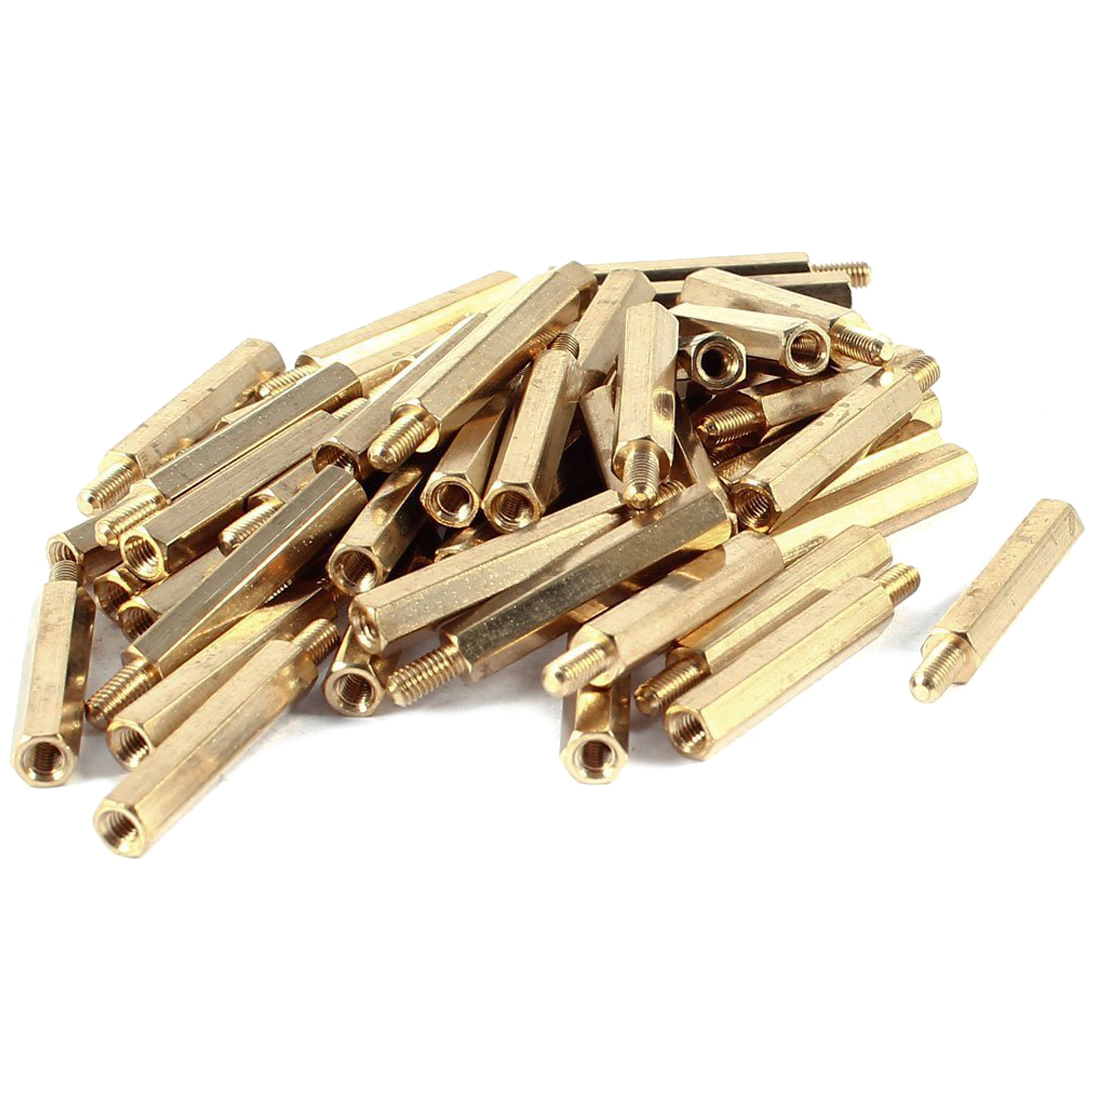 50pcs Brass Hex Standoff Spacer Screw Female to Male 25mm+6mm M3 3mm 100 pcs male to female screw brass pillars standoff spacer m2x6mmx9mm discount 50